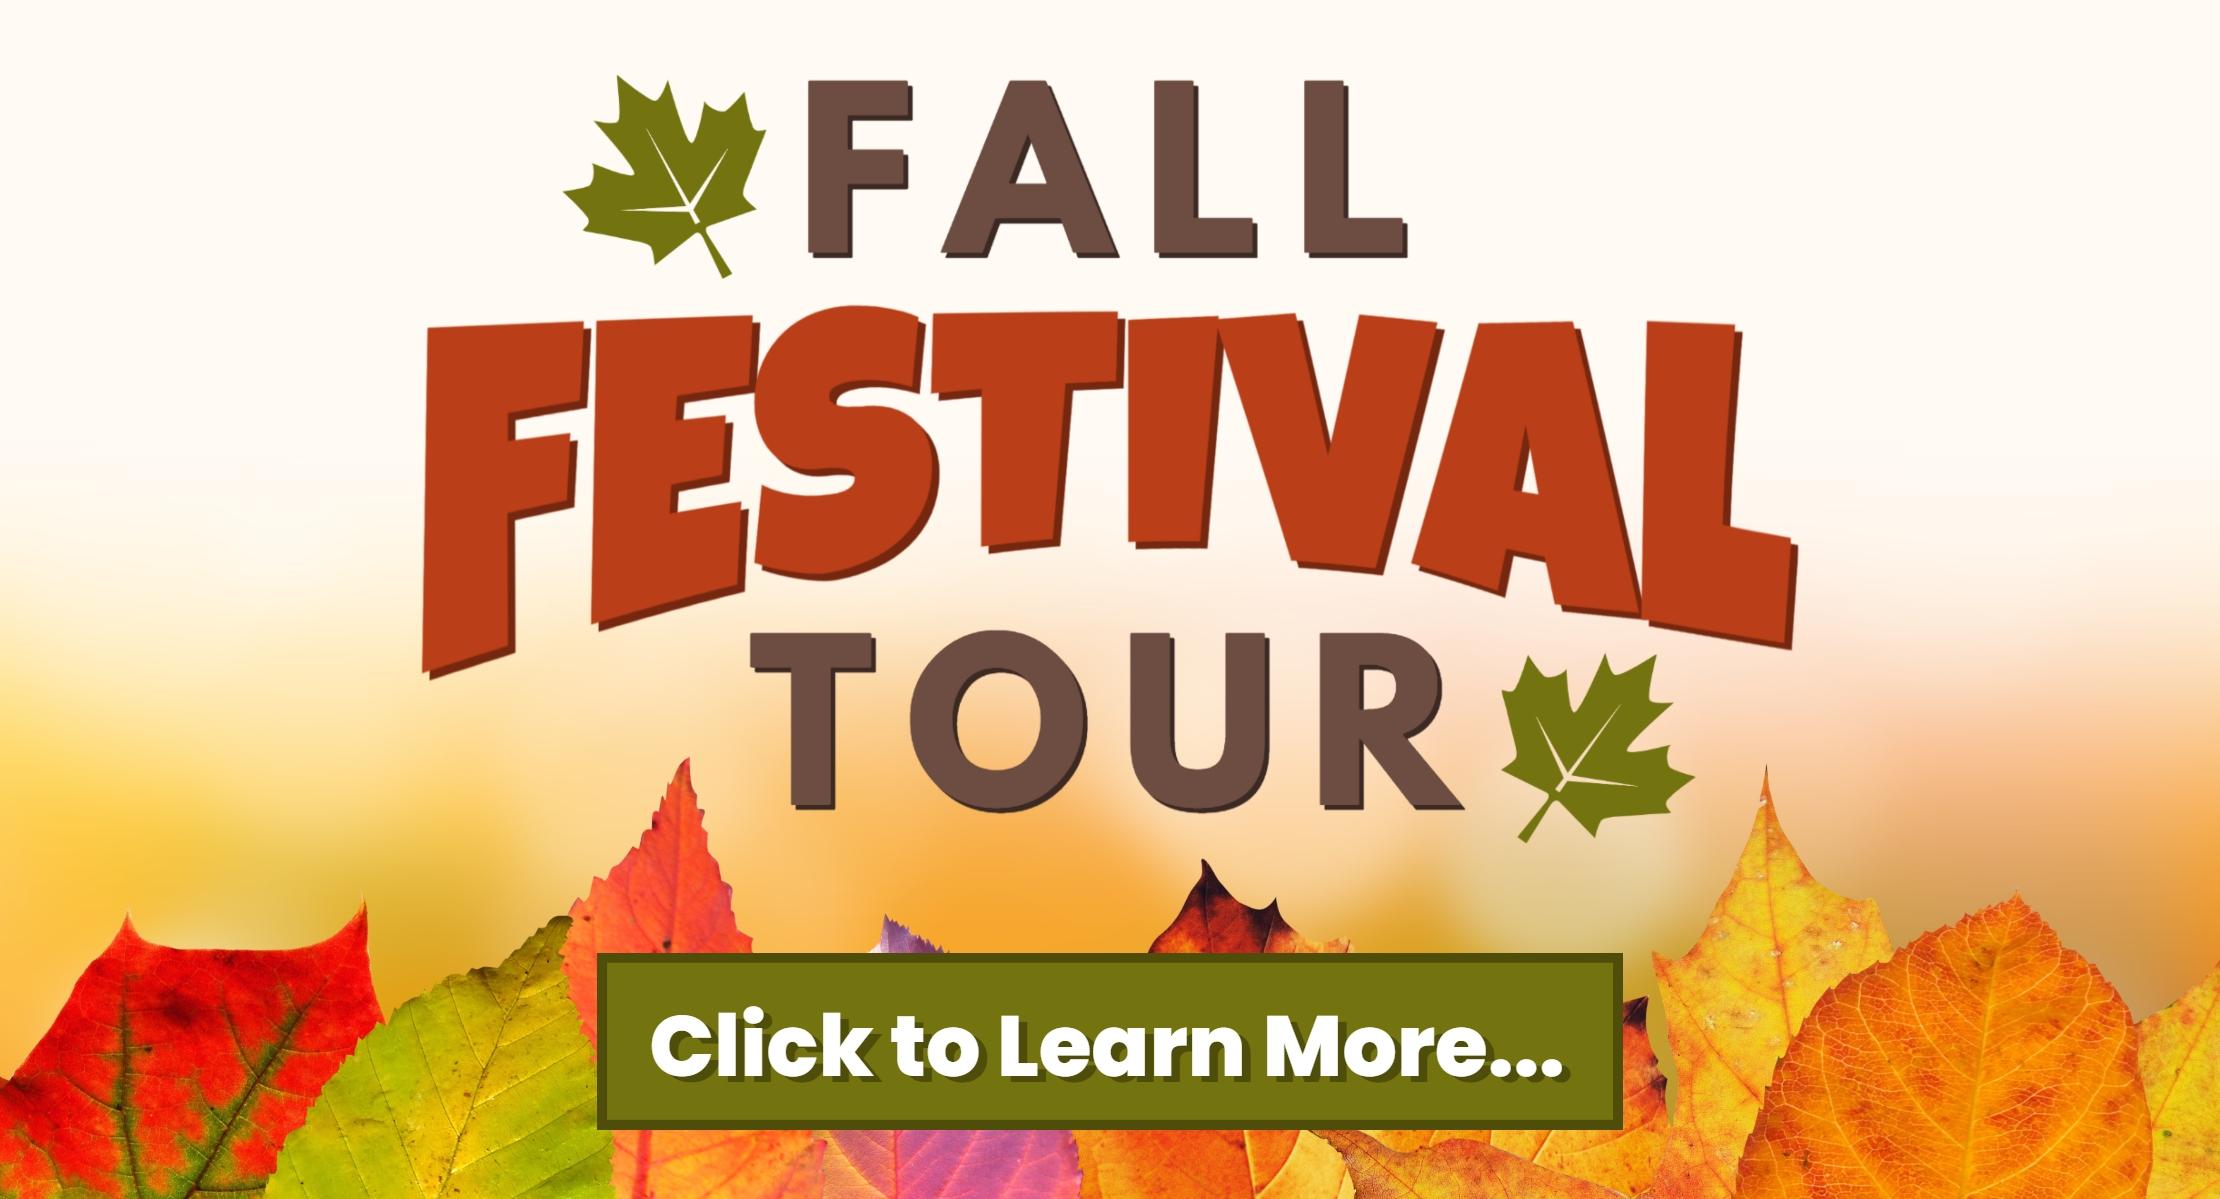 Fall Festival Tour